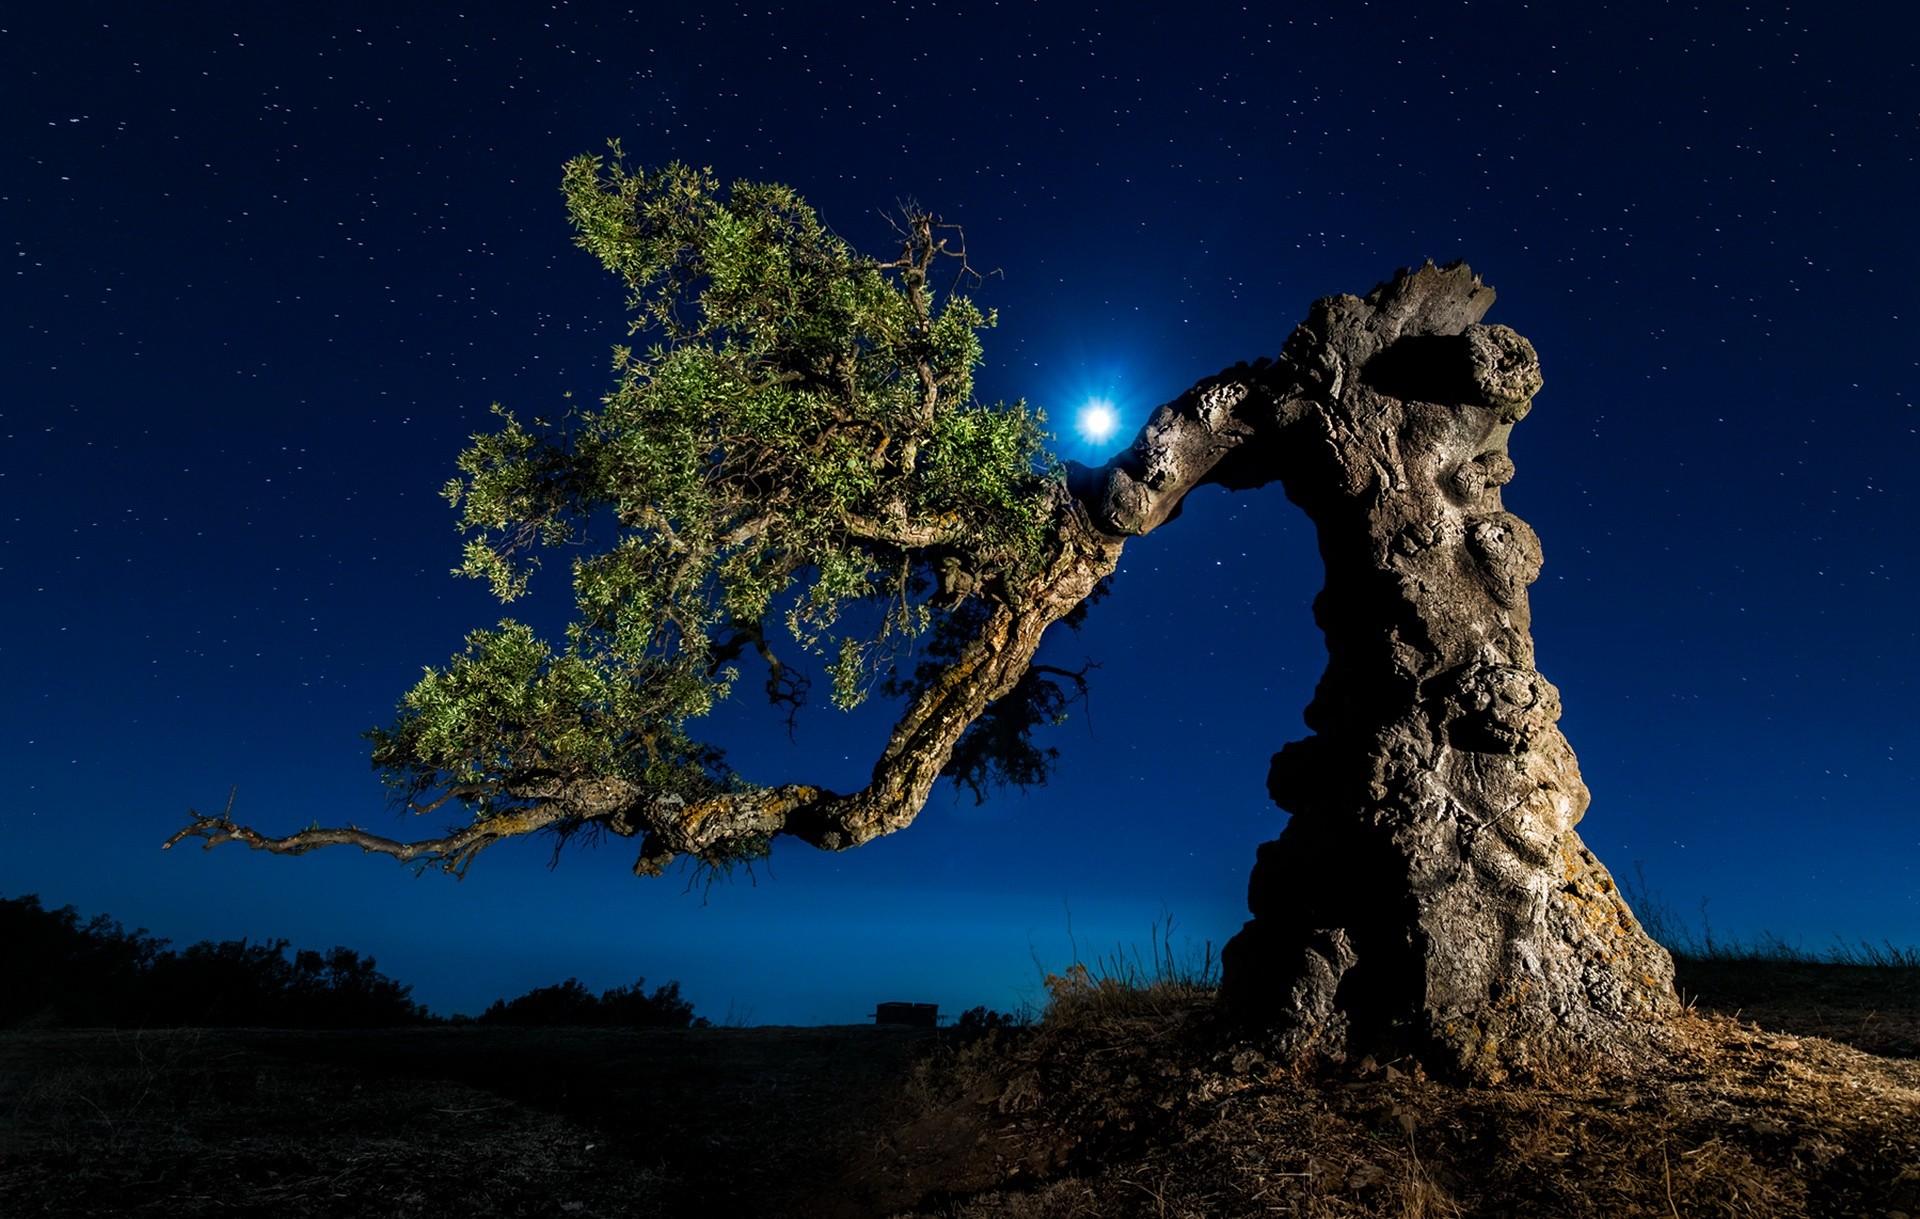 General 1920x1219 landscape trees nature moon rays night starry night night sky stars blue sky branch